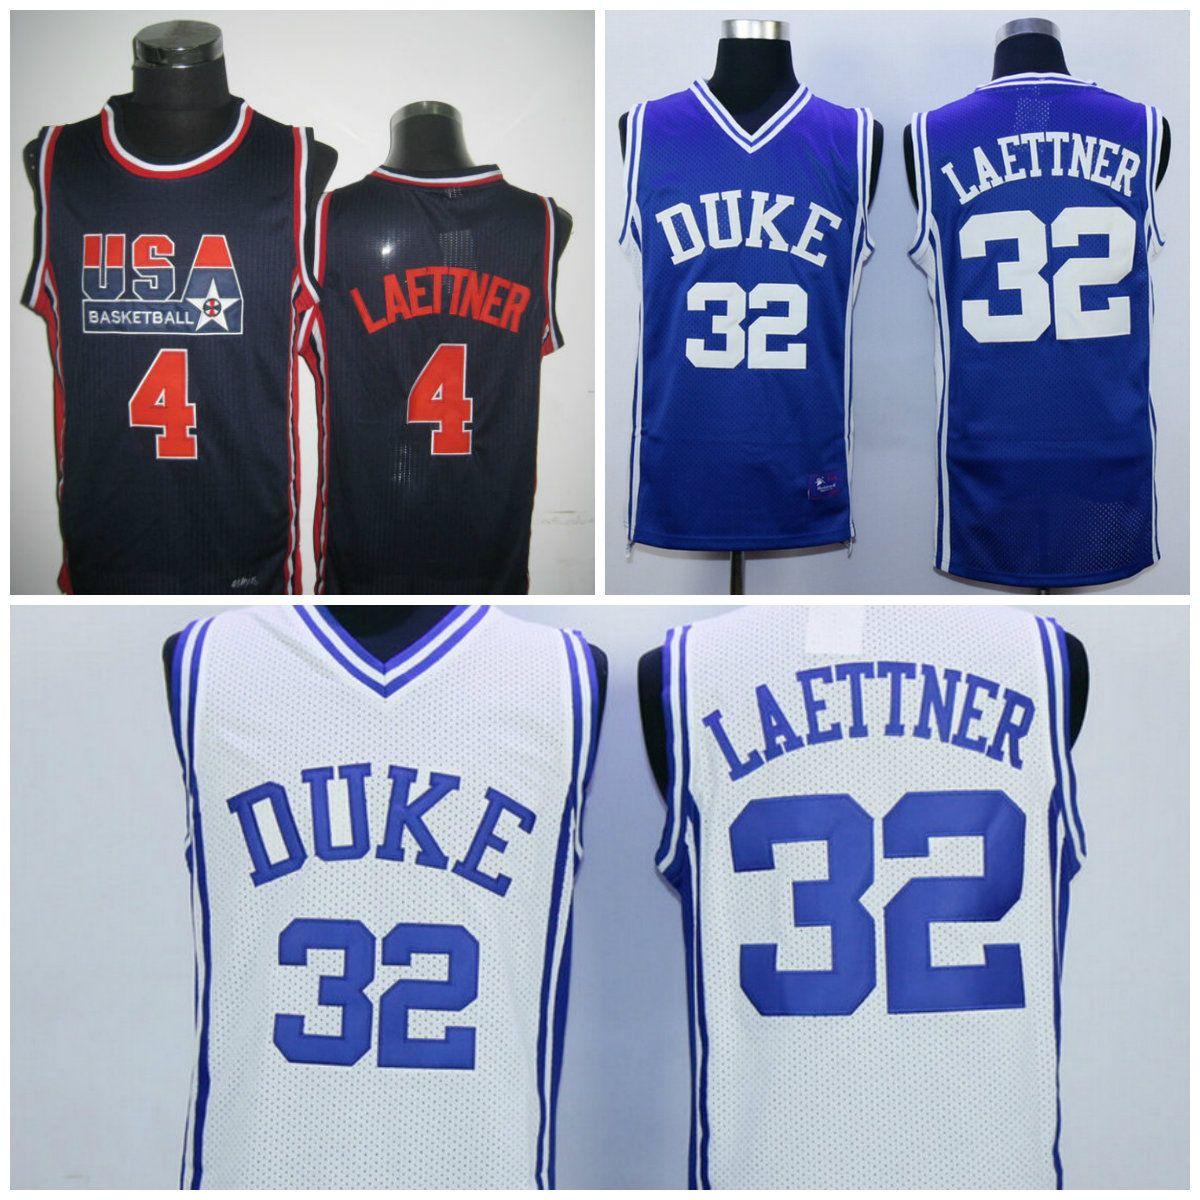 c0c051e8391 2019 2017 Duke Blue Devils Jerseys College 3 Grayson Allen 1 Kyrie Irving  Shirt 1 Jabari Parker 3 Grayson Allen 5 Tyus Jones 12 Justise Winslow From  ...